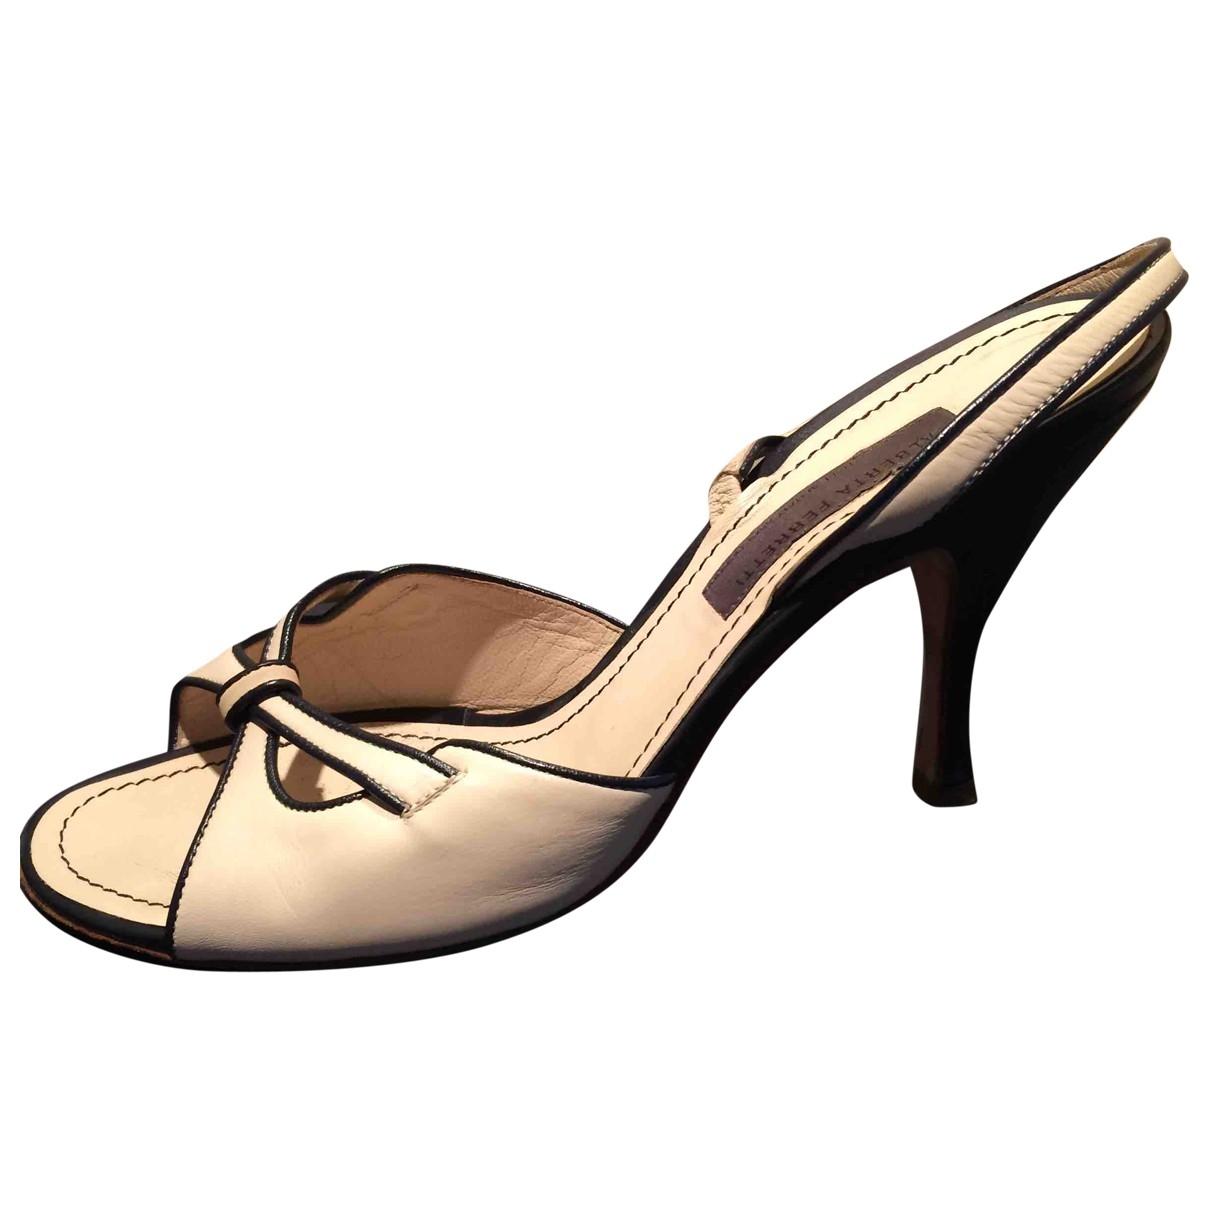 Alberta Ferretti \N Beige Leather Sandals for Women 37.5 IT